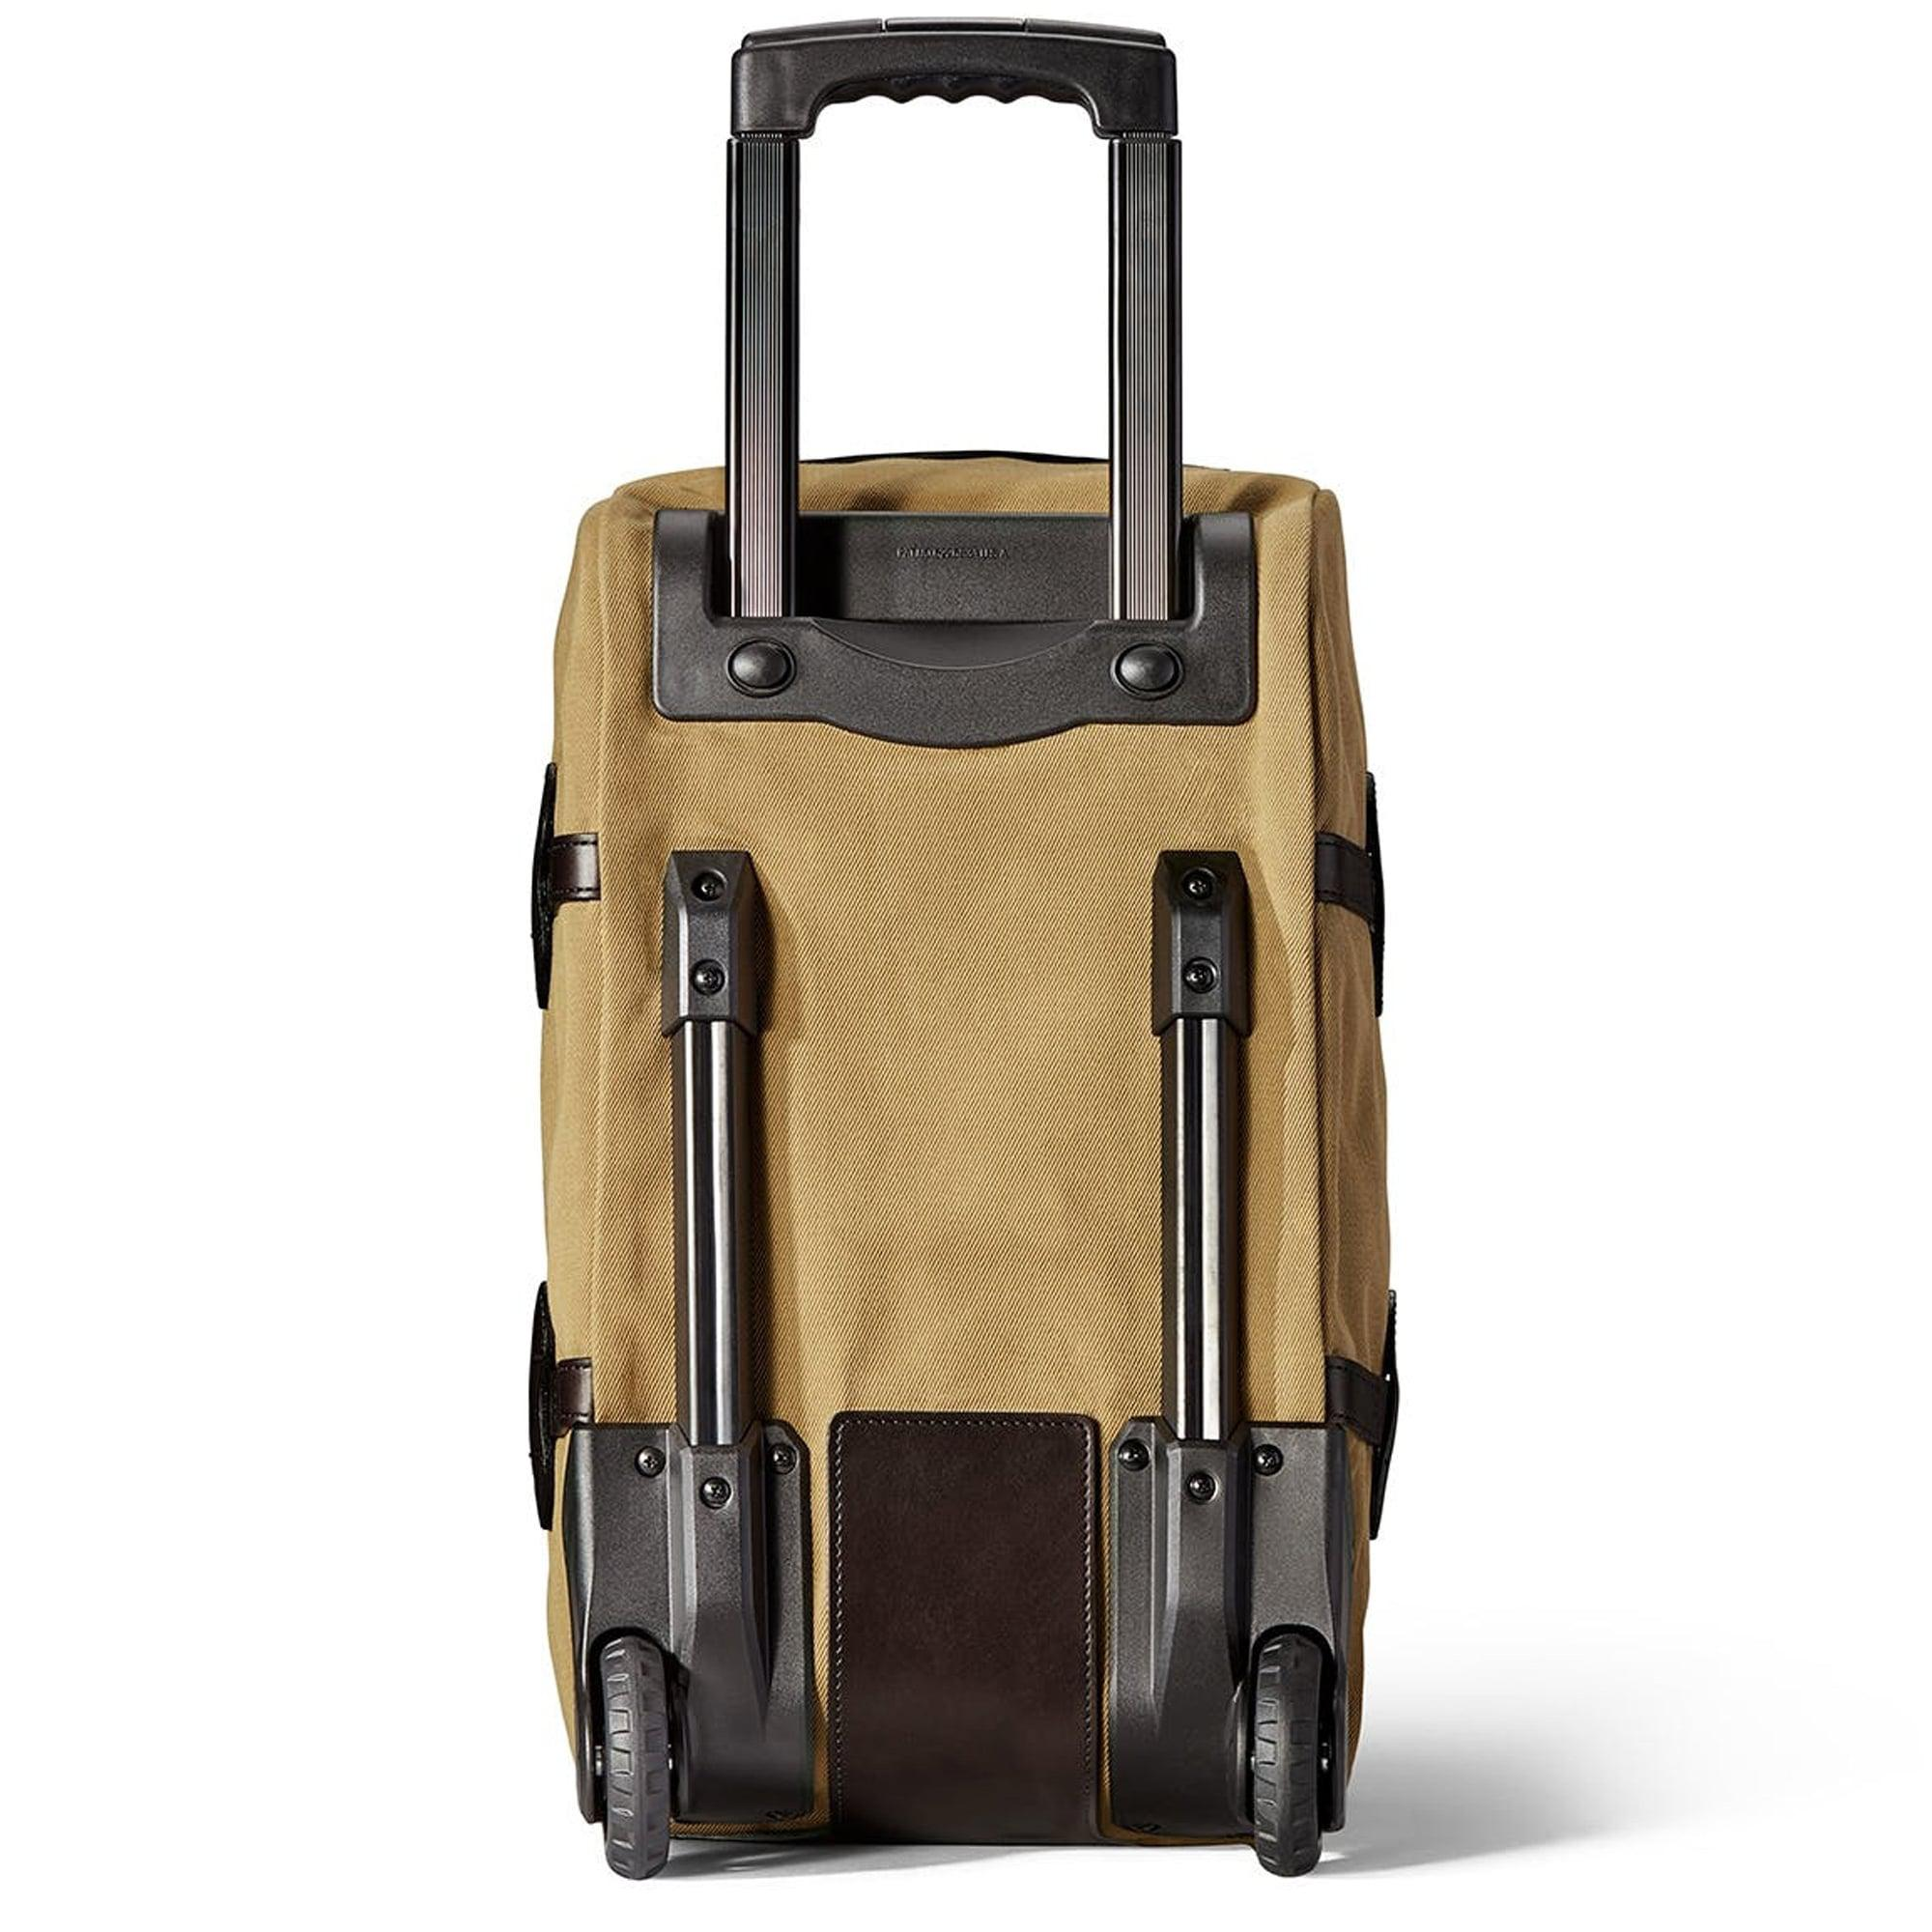 87b47623fcf9 Filson - Multicolor Small Rolling Duffle Bag for Men - Lyst. View fullscreen